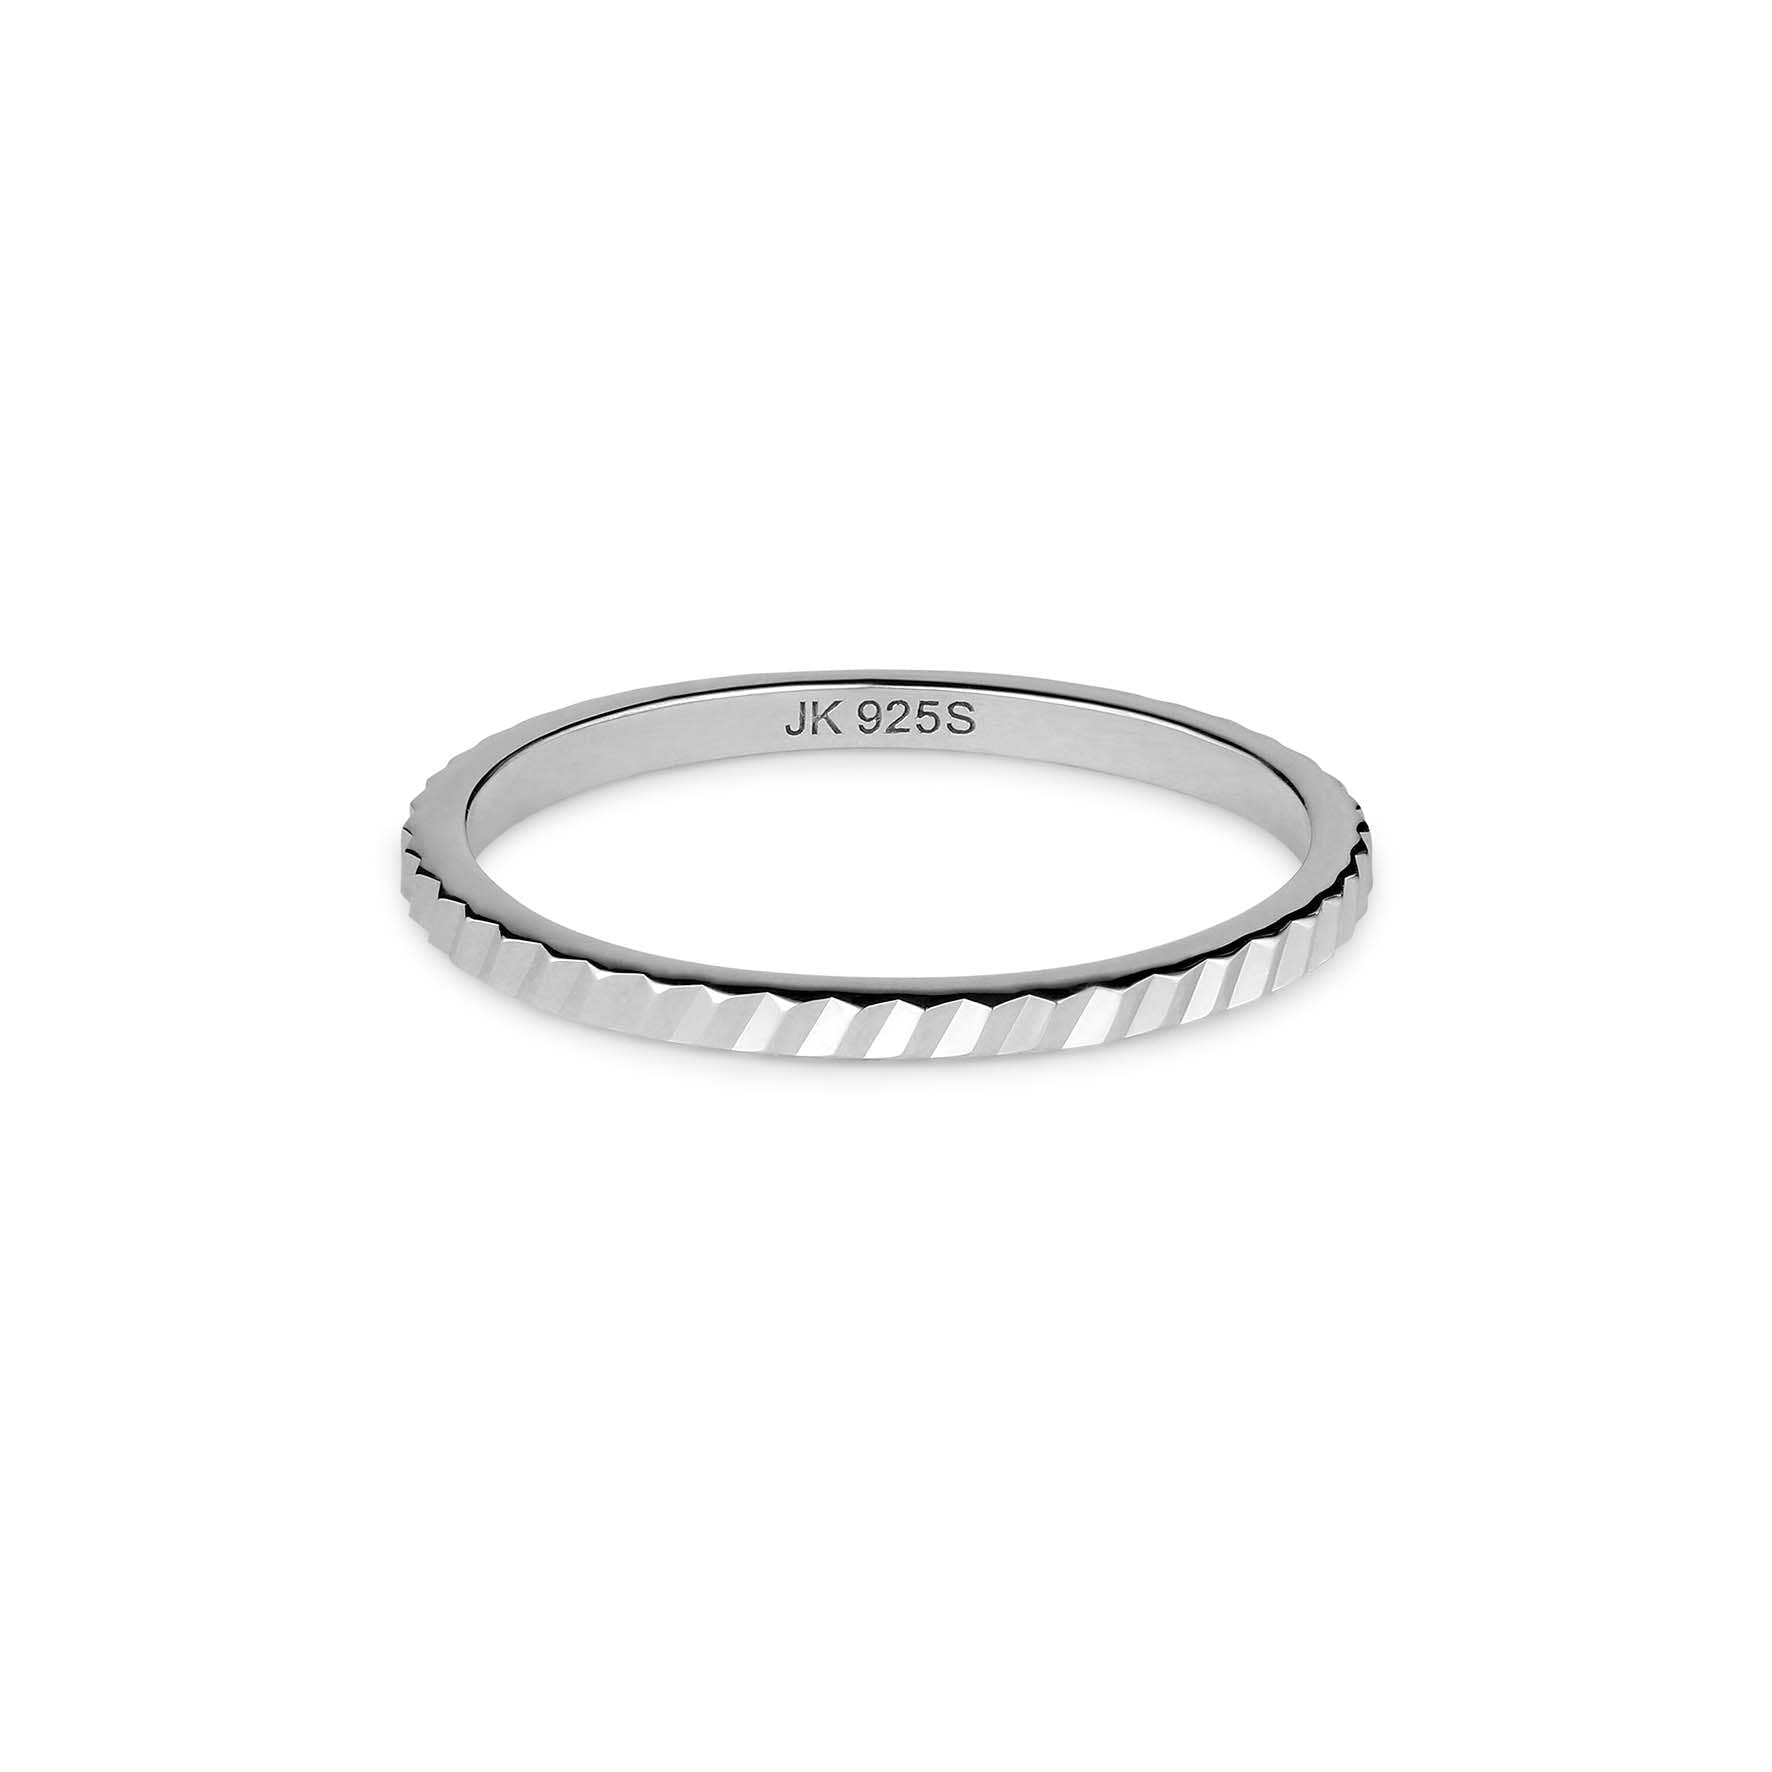 Small Reflection Ring von Jane Kønig in Silber Sterling 925